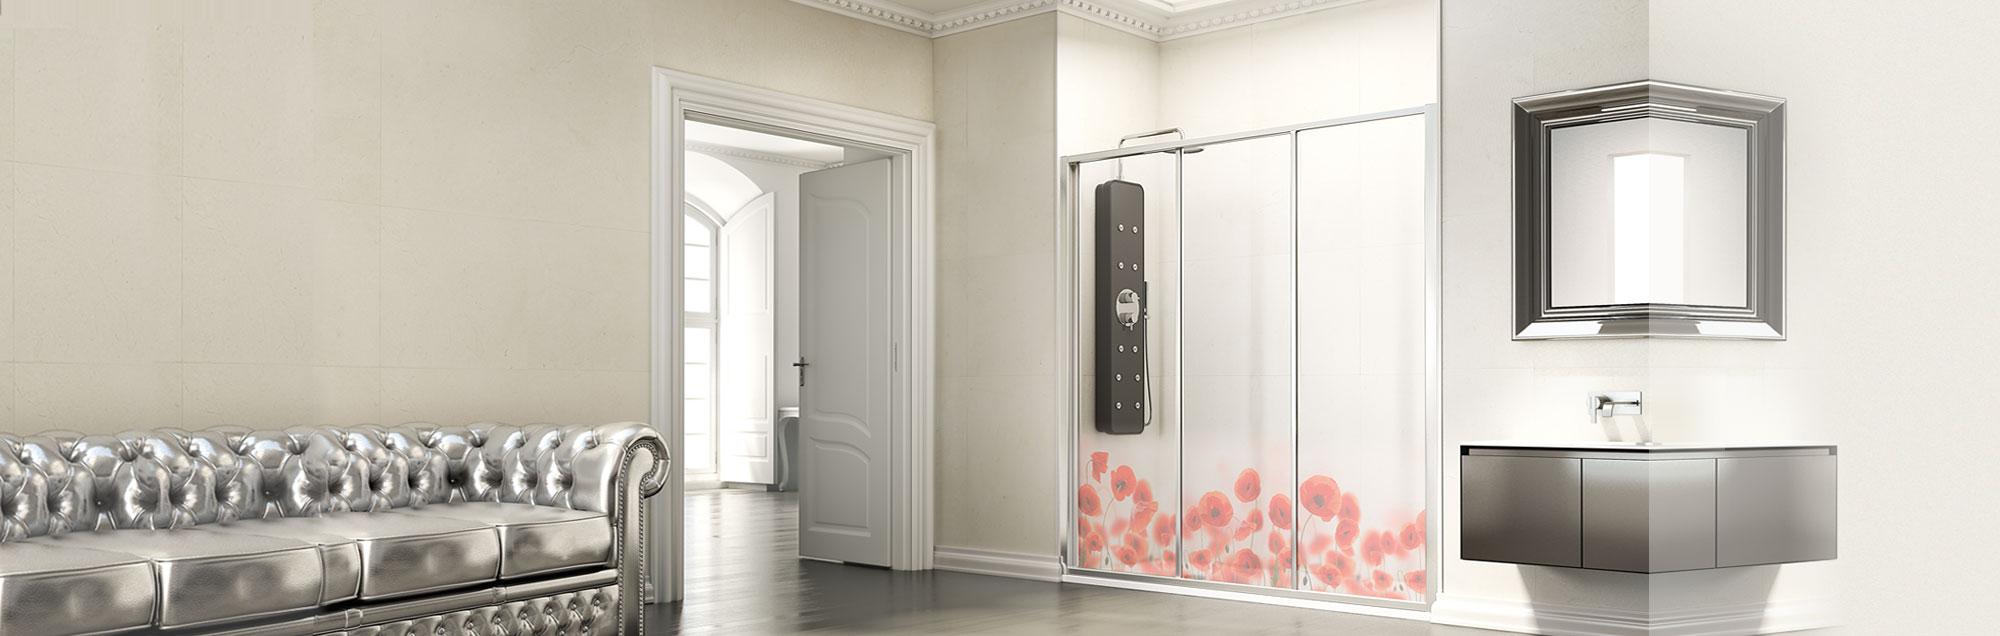 Serie Ecodux de mamparas correderas de baño a medida